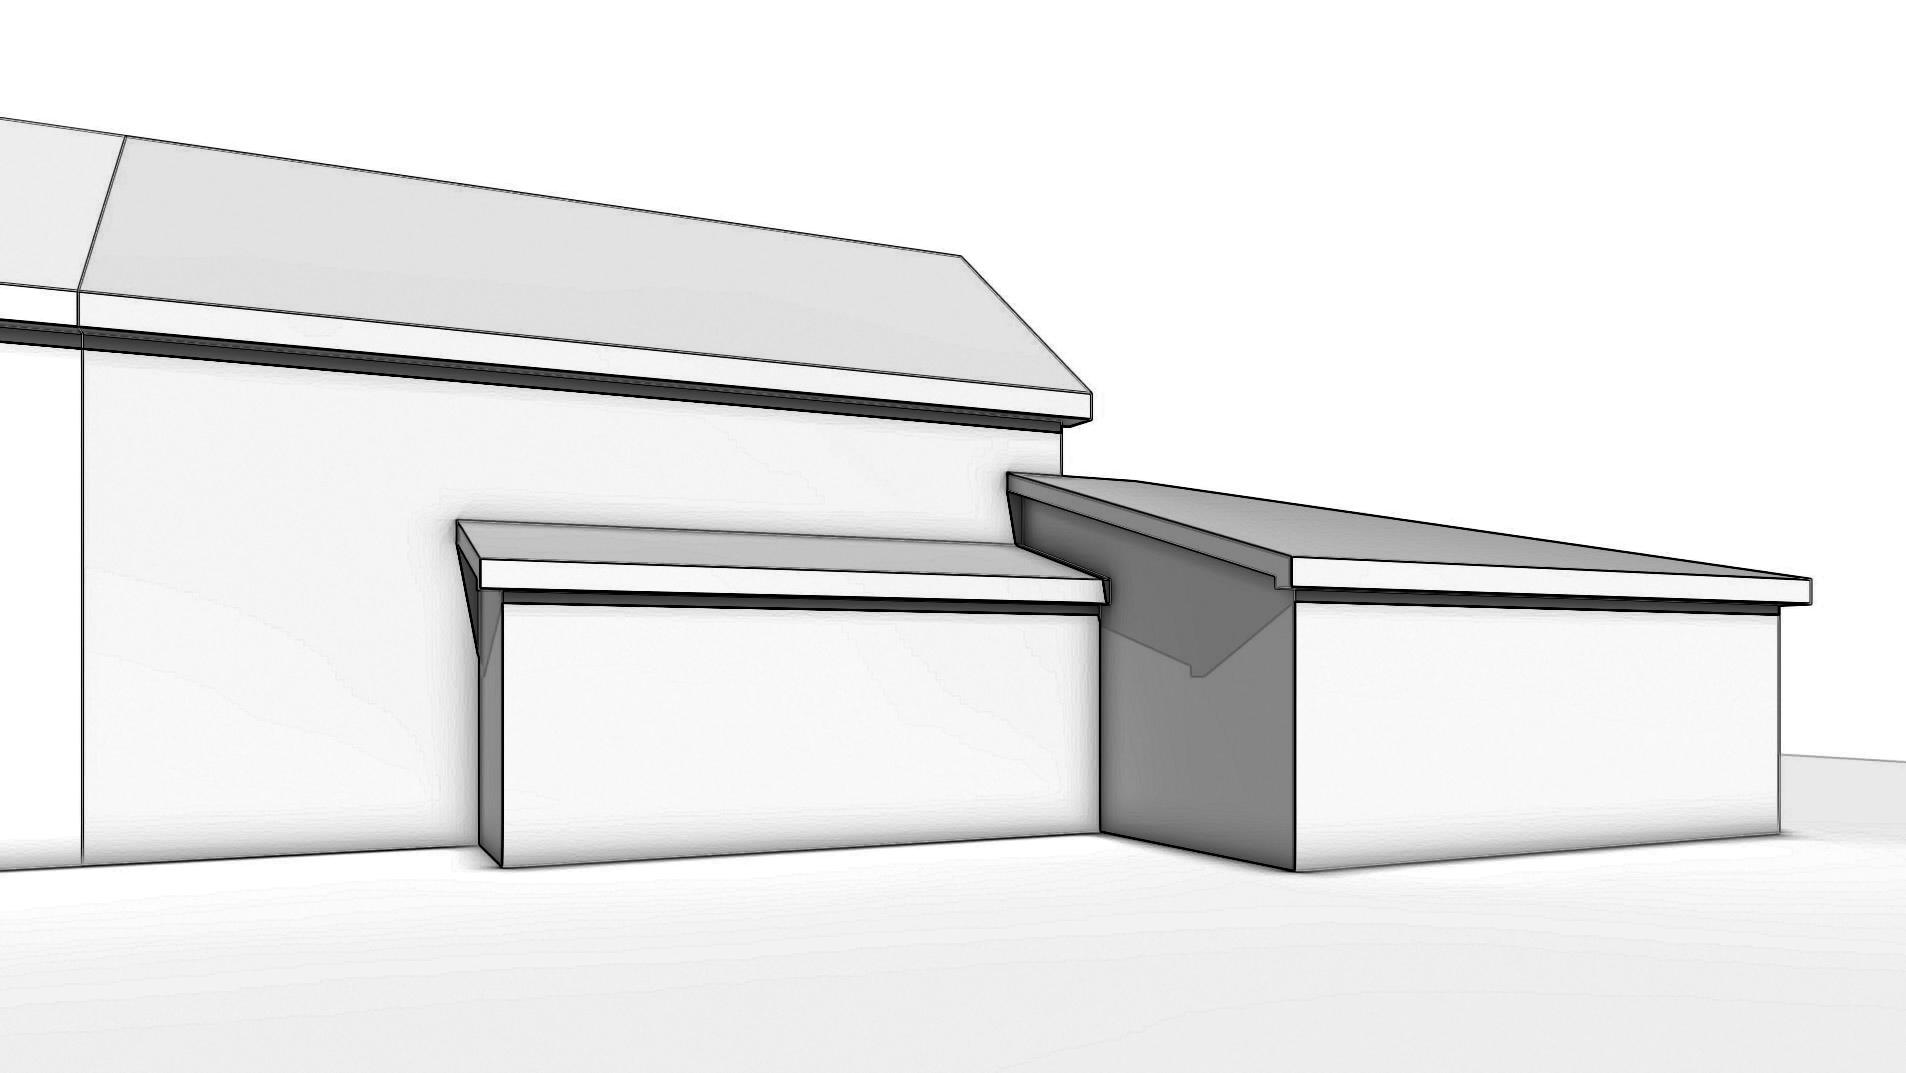 Roofline2-d.jpg